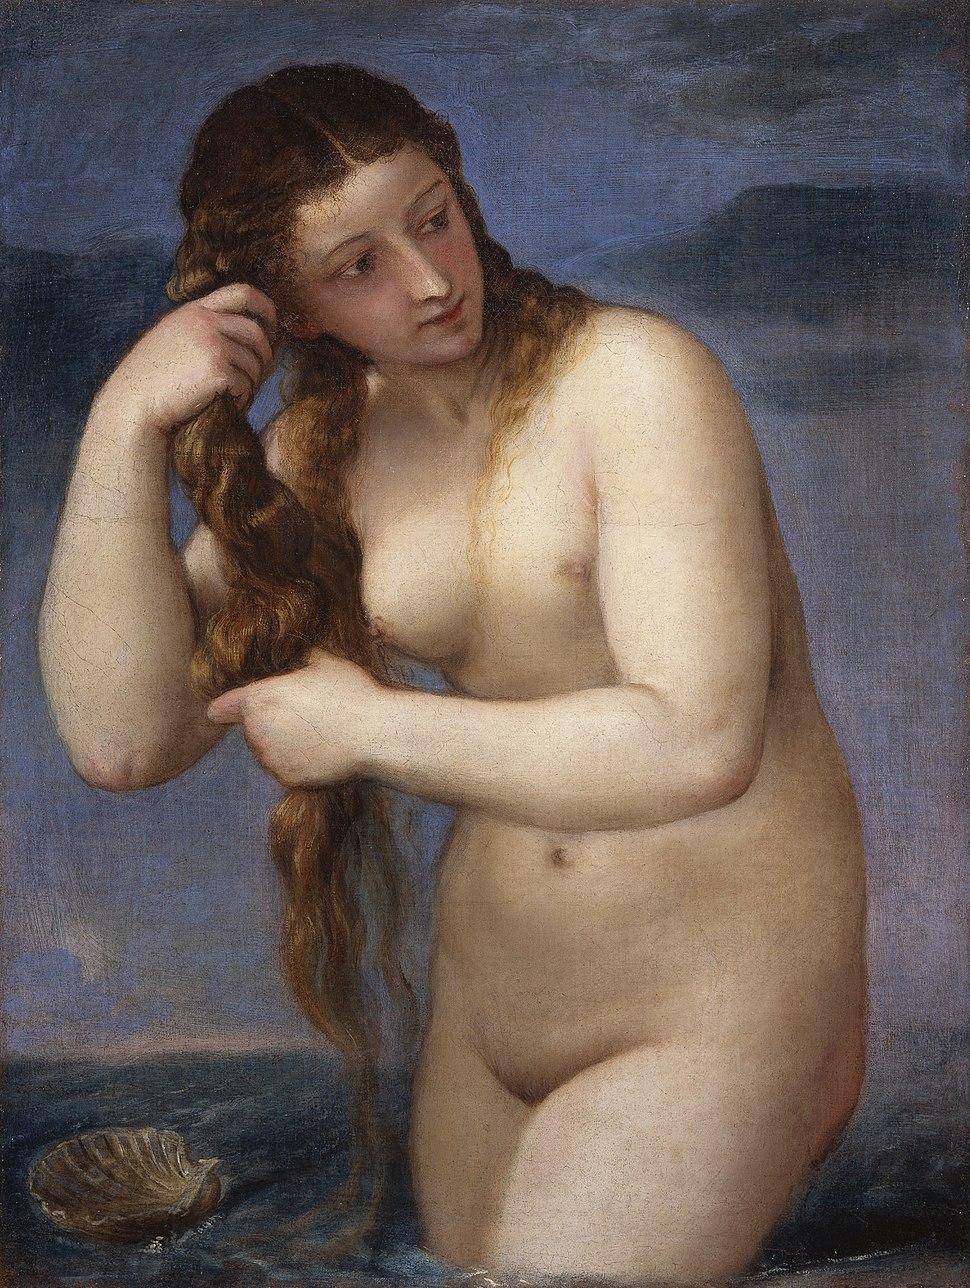 TITIAN - Venus Anadyomene (National Galleries of Scotland, c. 1520. Oil on canvas, 75.8 x 57.6 cm)